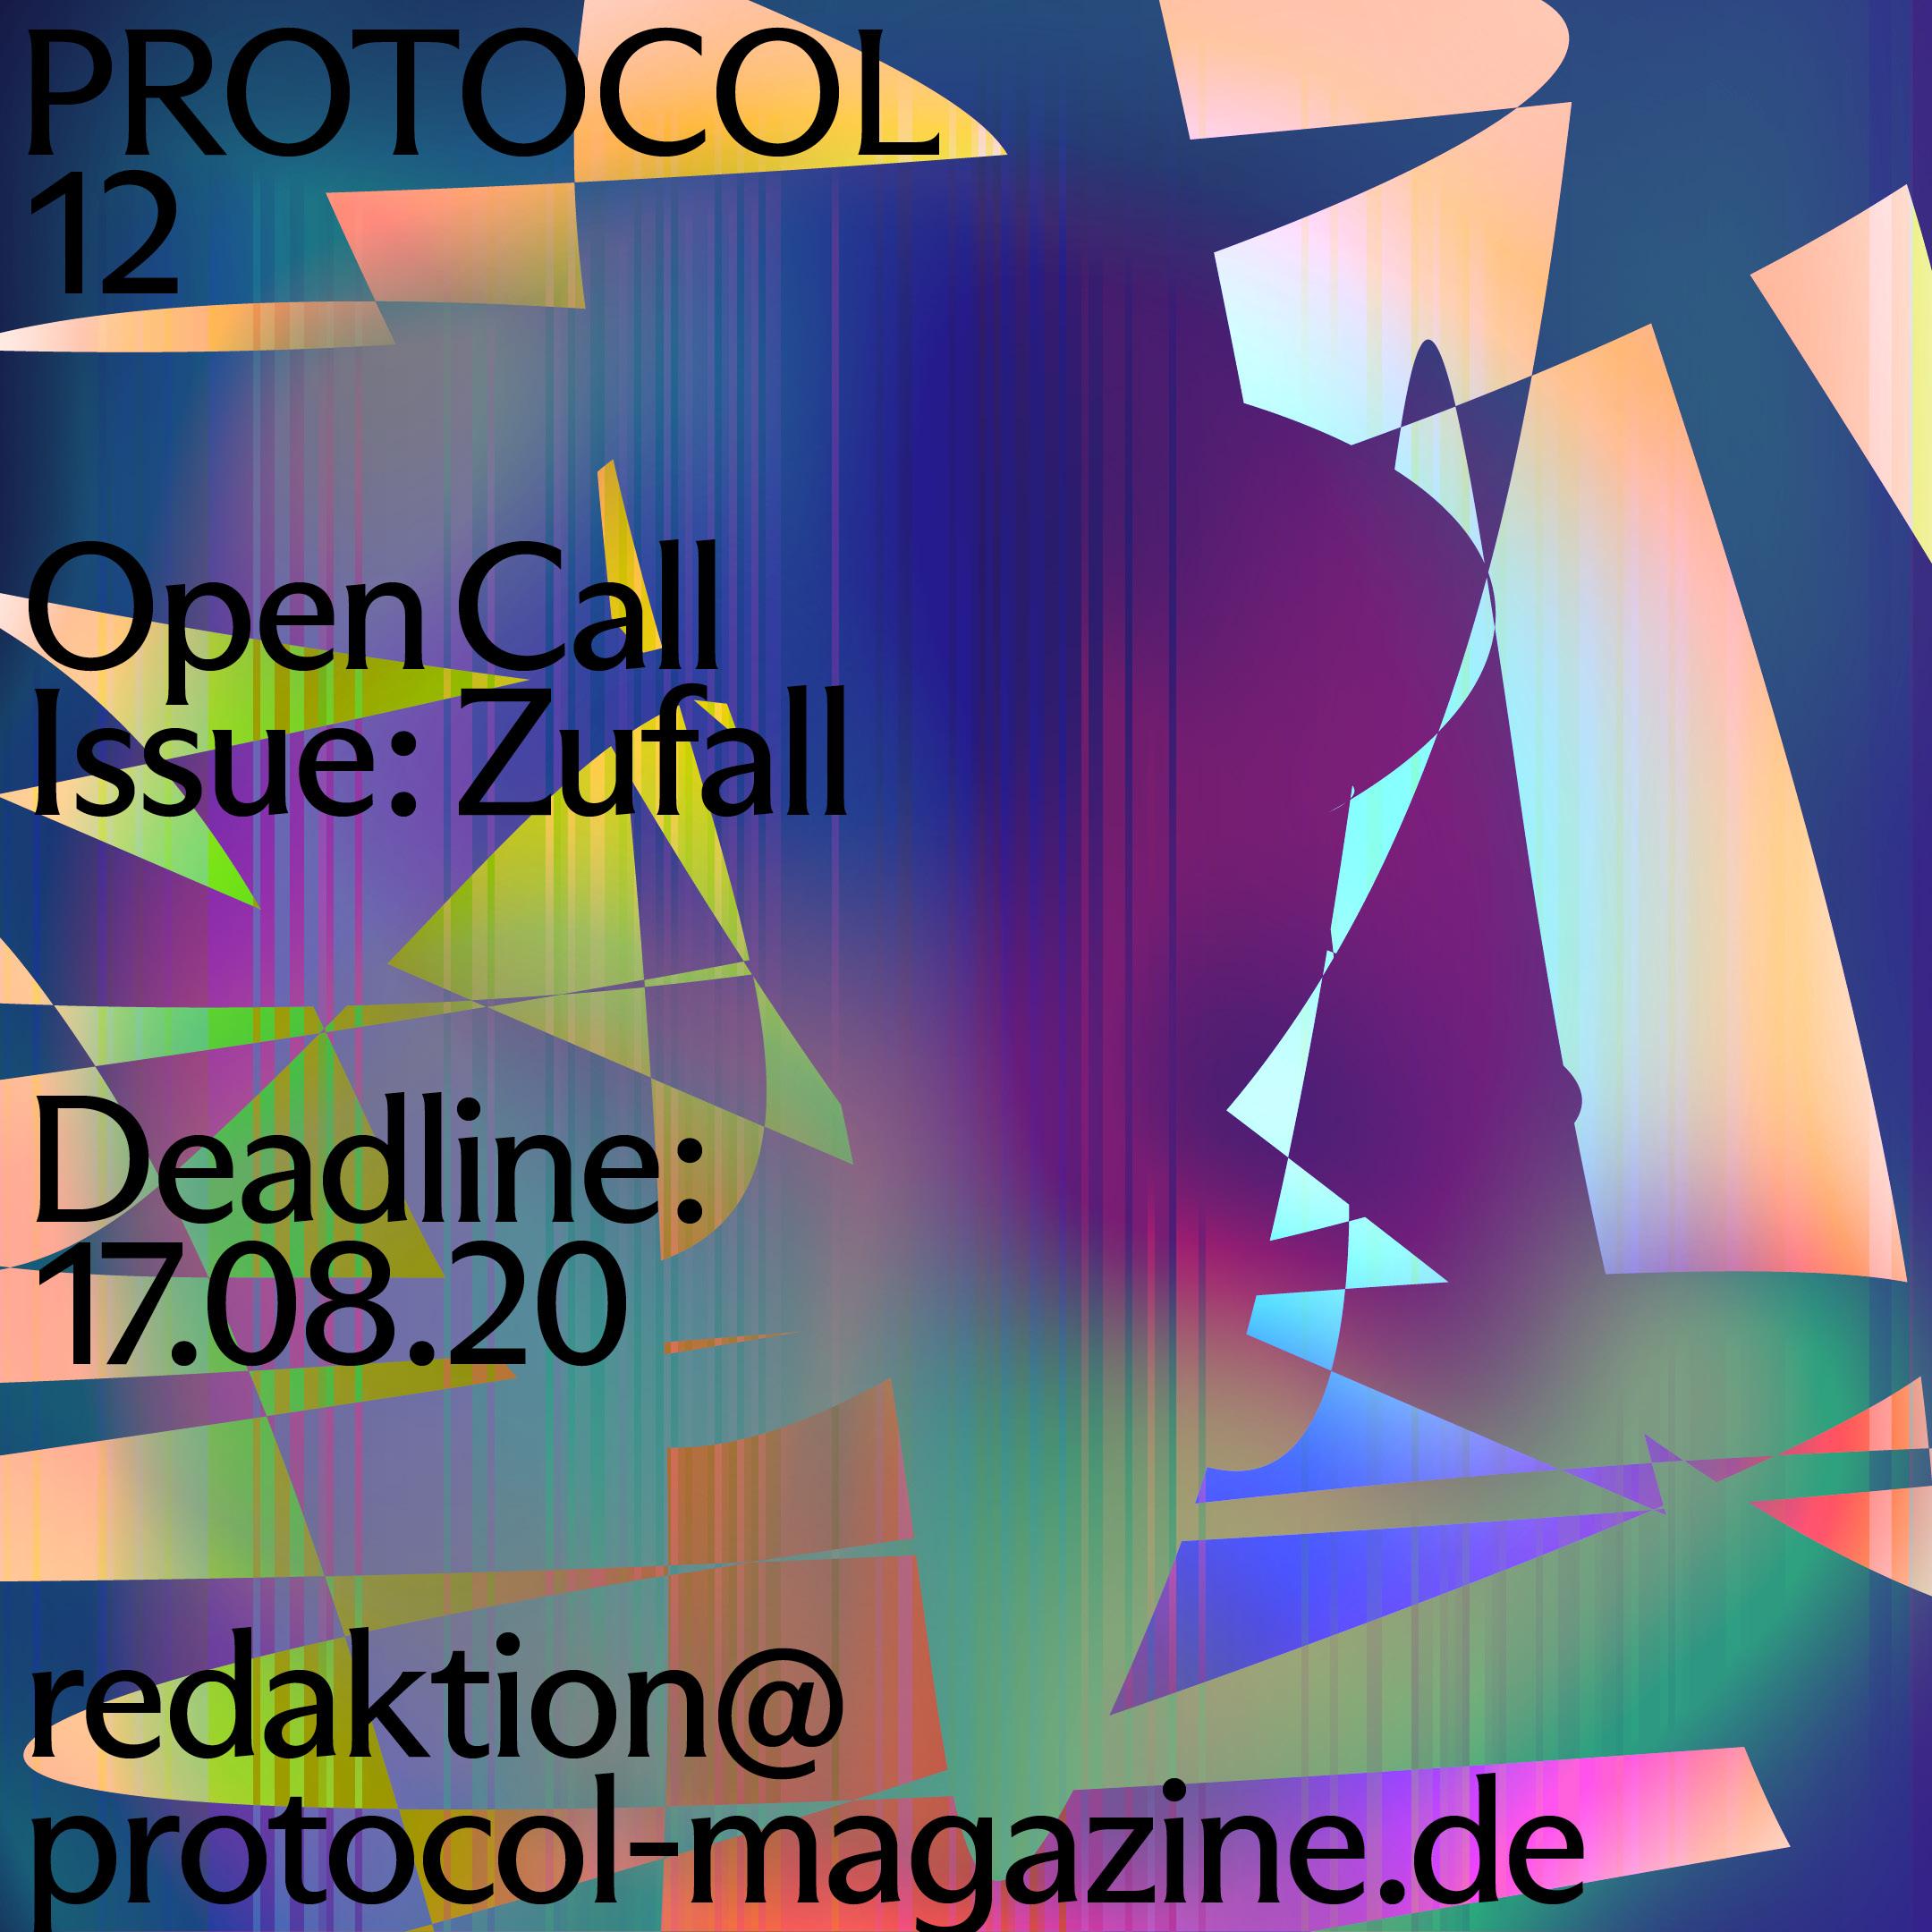 p12_Instagram-Redaktion_Protocol-Magazin_Magazin-fuer-Architektur-im-Kontext25